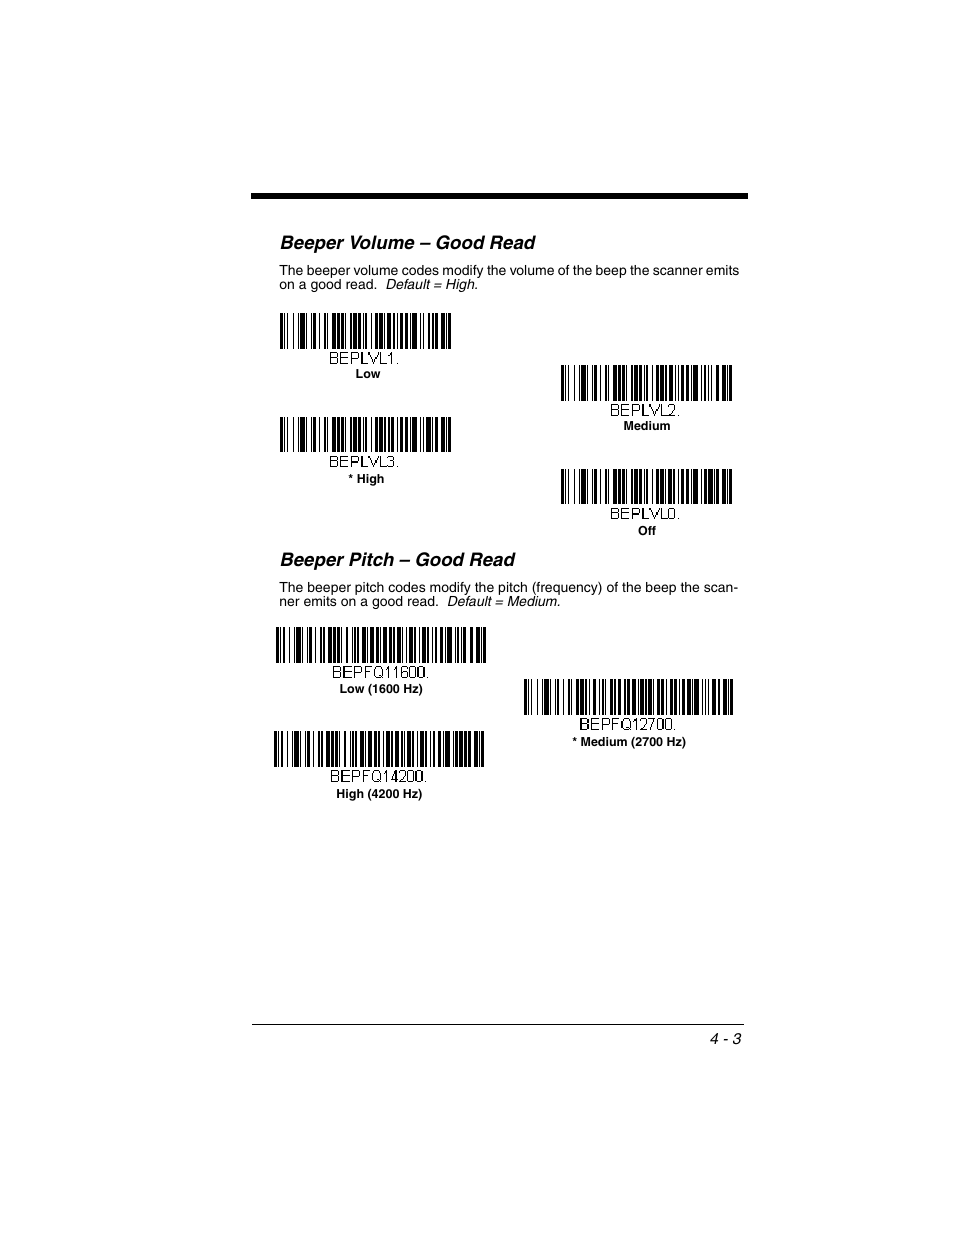 Beeper volume – good read, Beeper pitch – good read